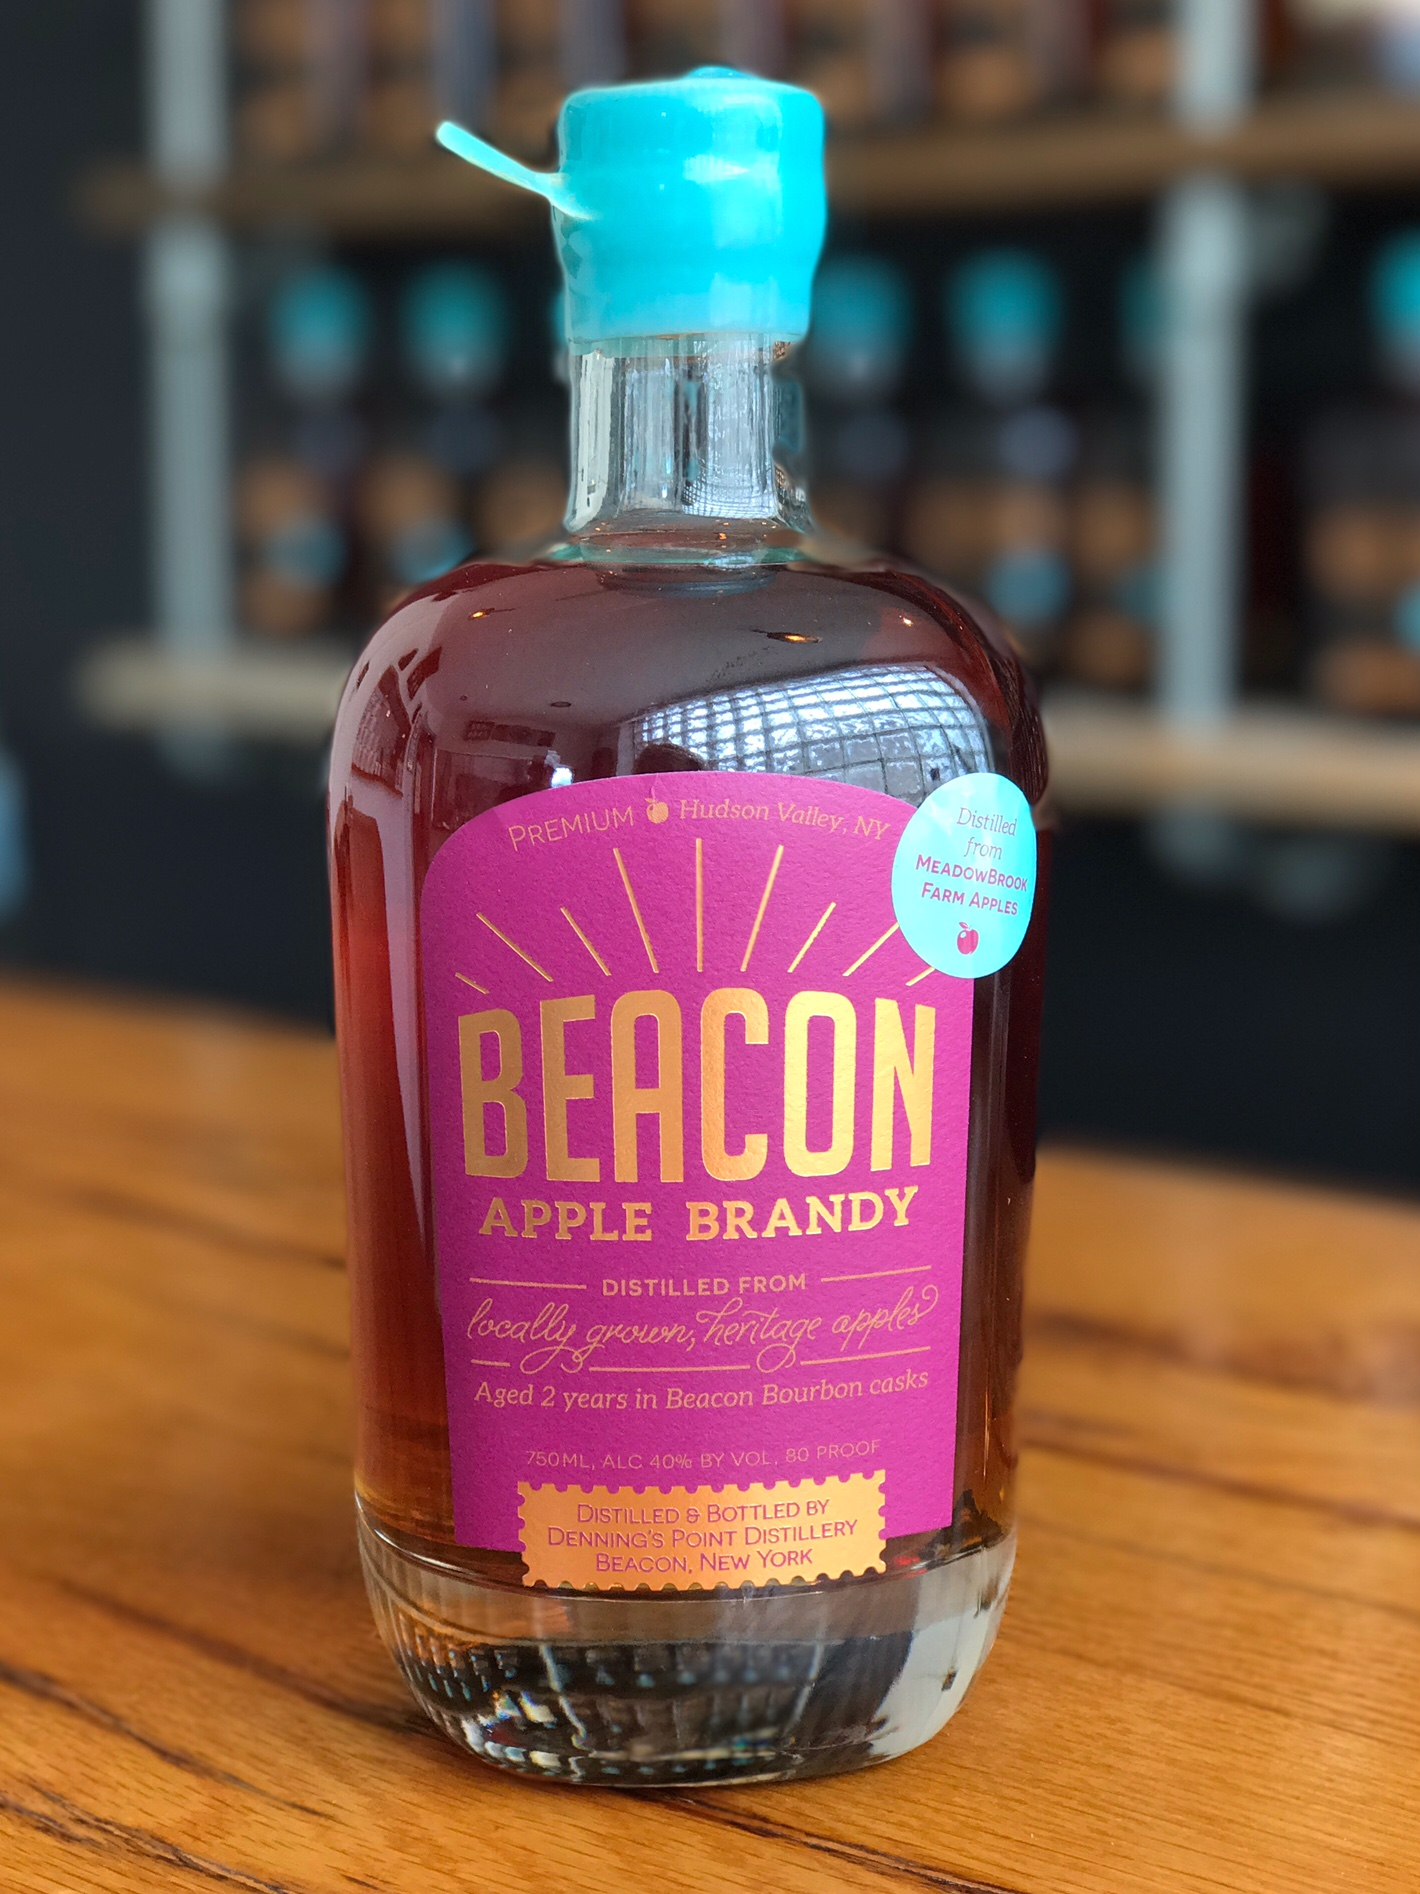 Beacon Apple Brandy.JPG